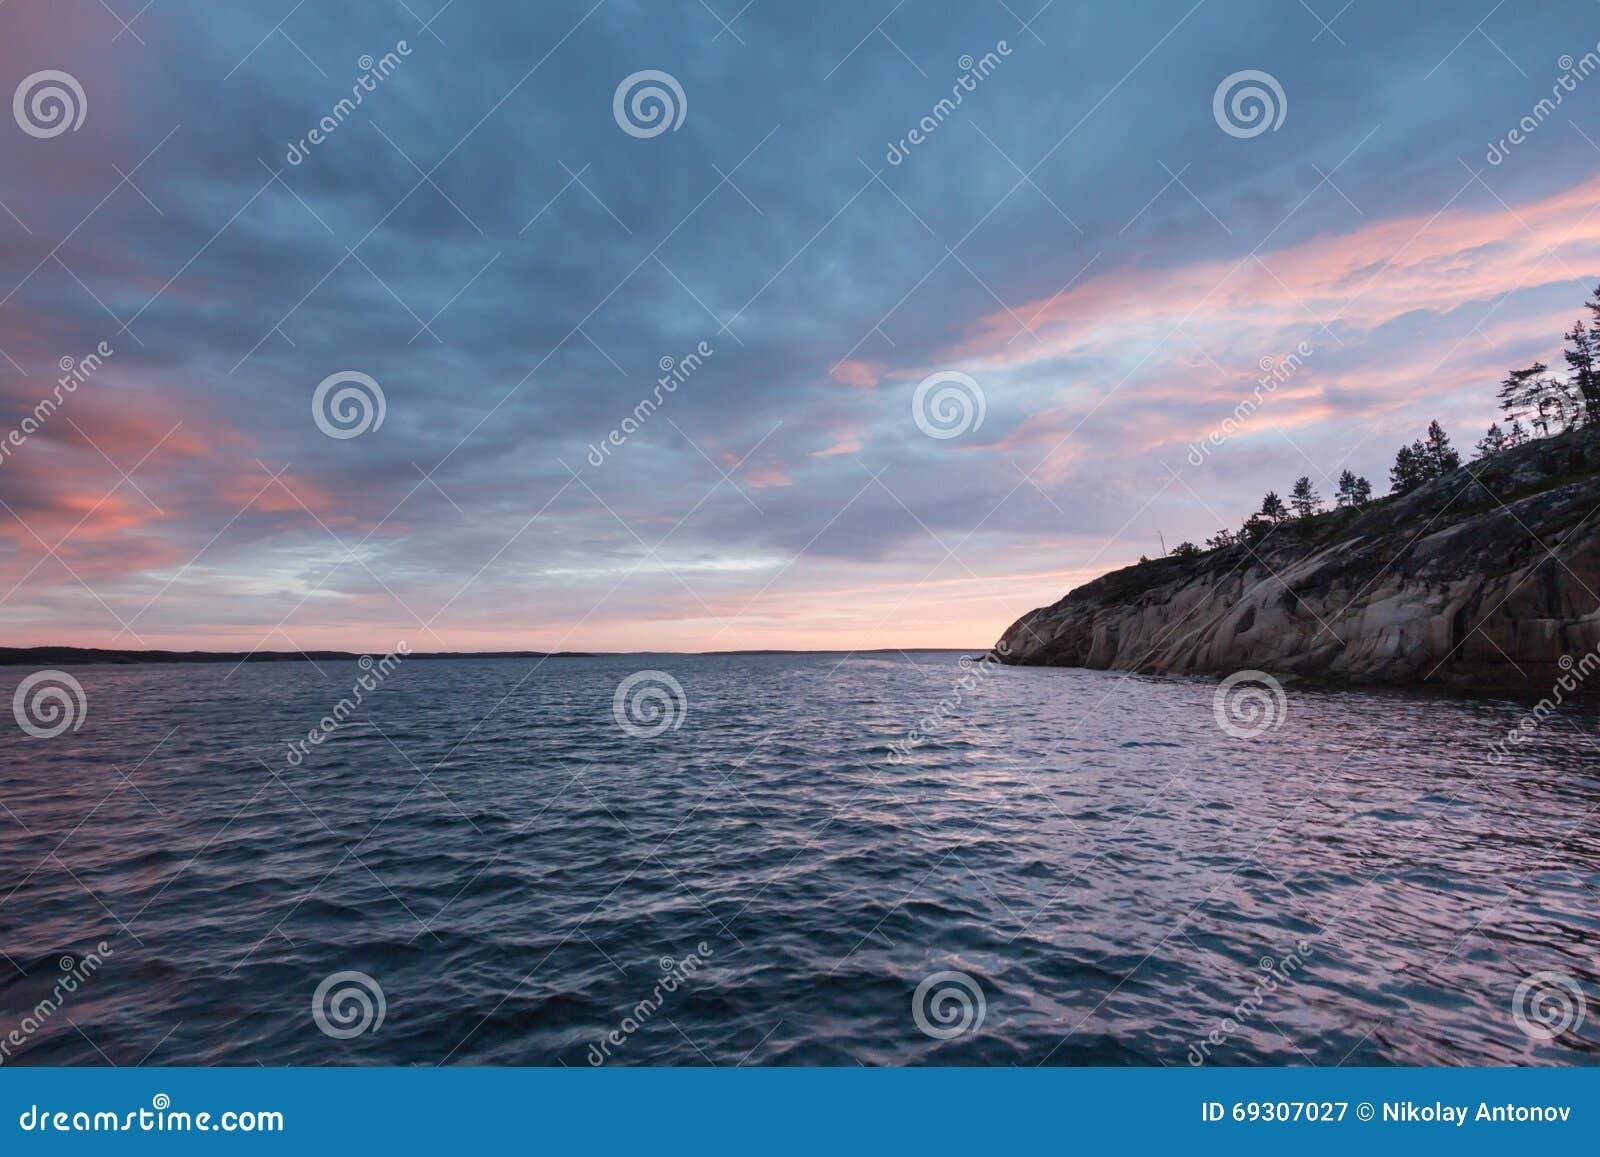 Sunset over White sea in Russia